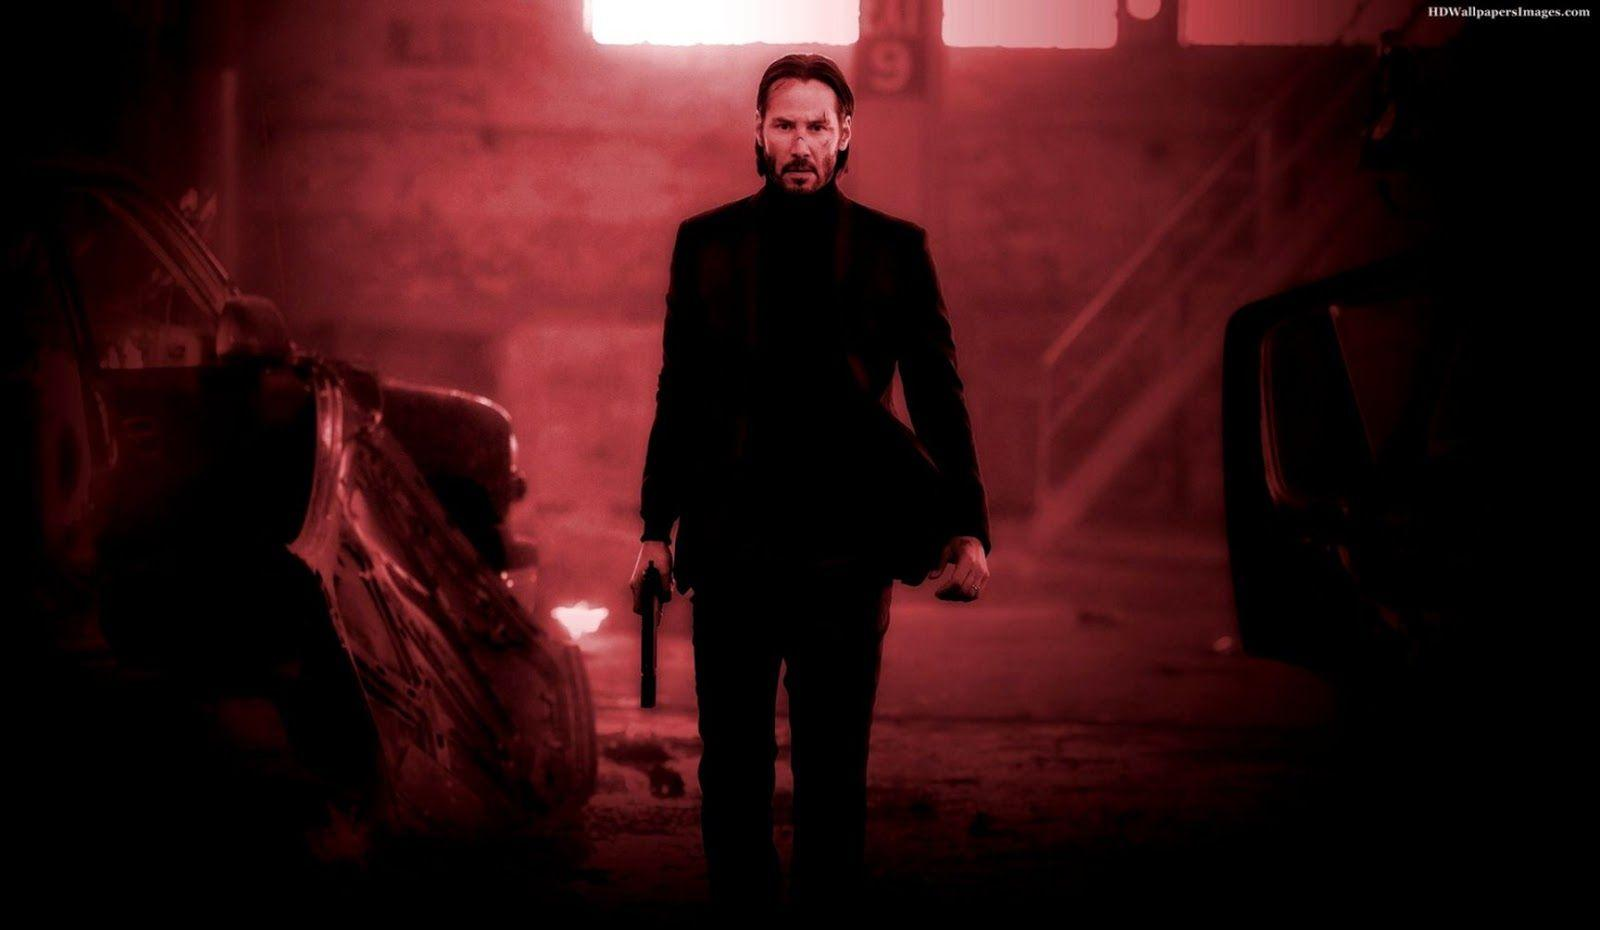 John wick 2014 movie download in hd   Free HD Movie Download